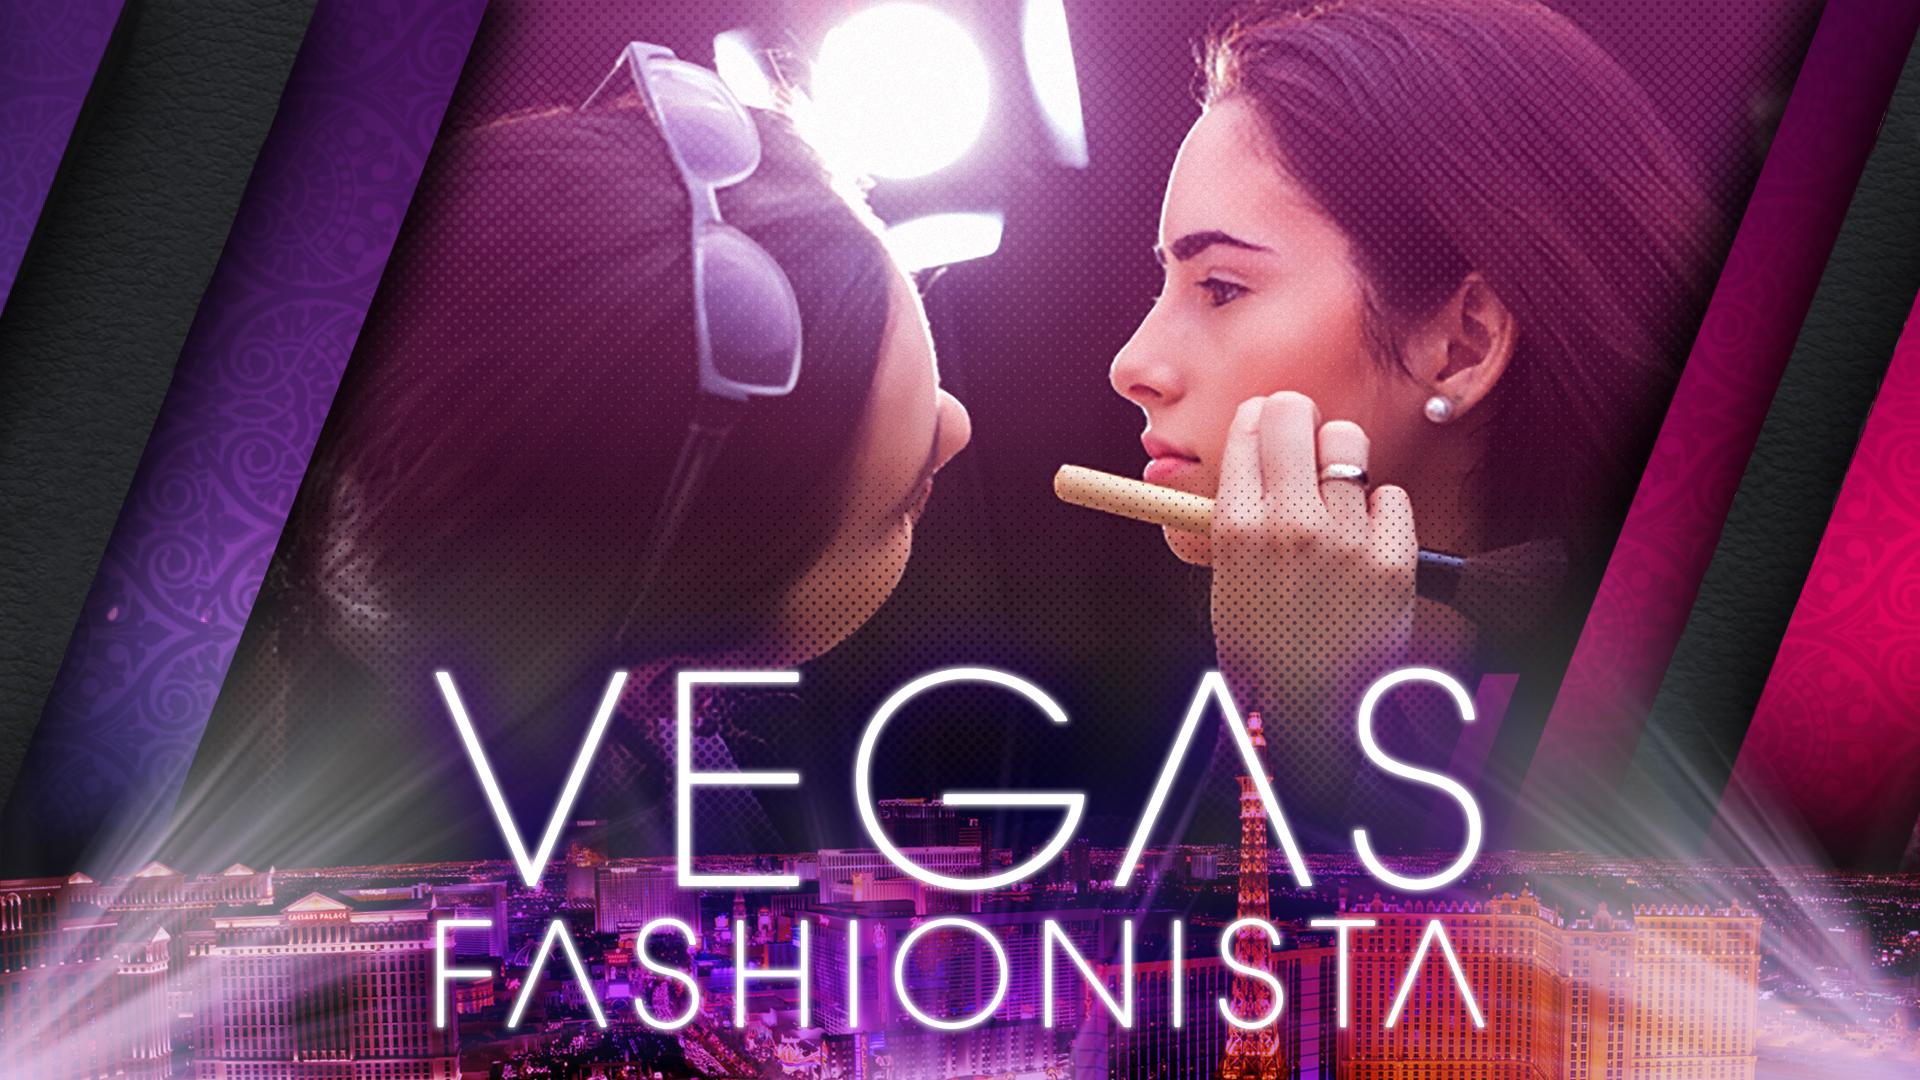 Vegas Fashionista